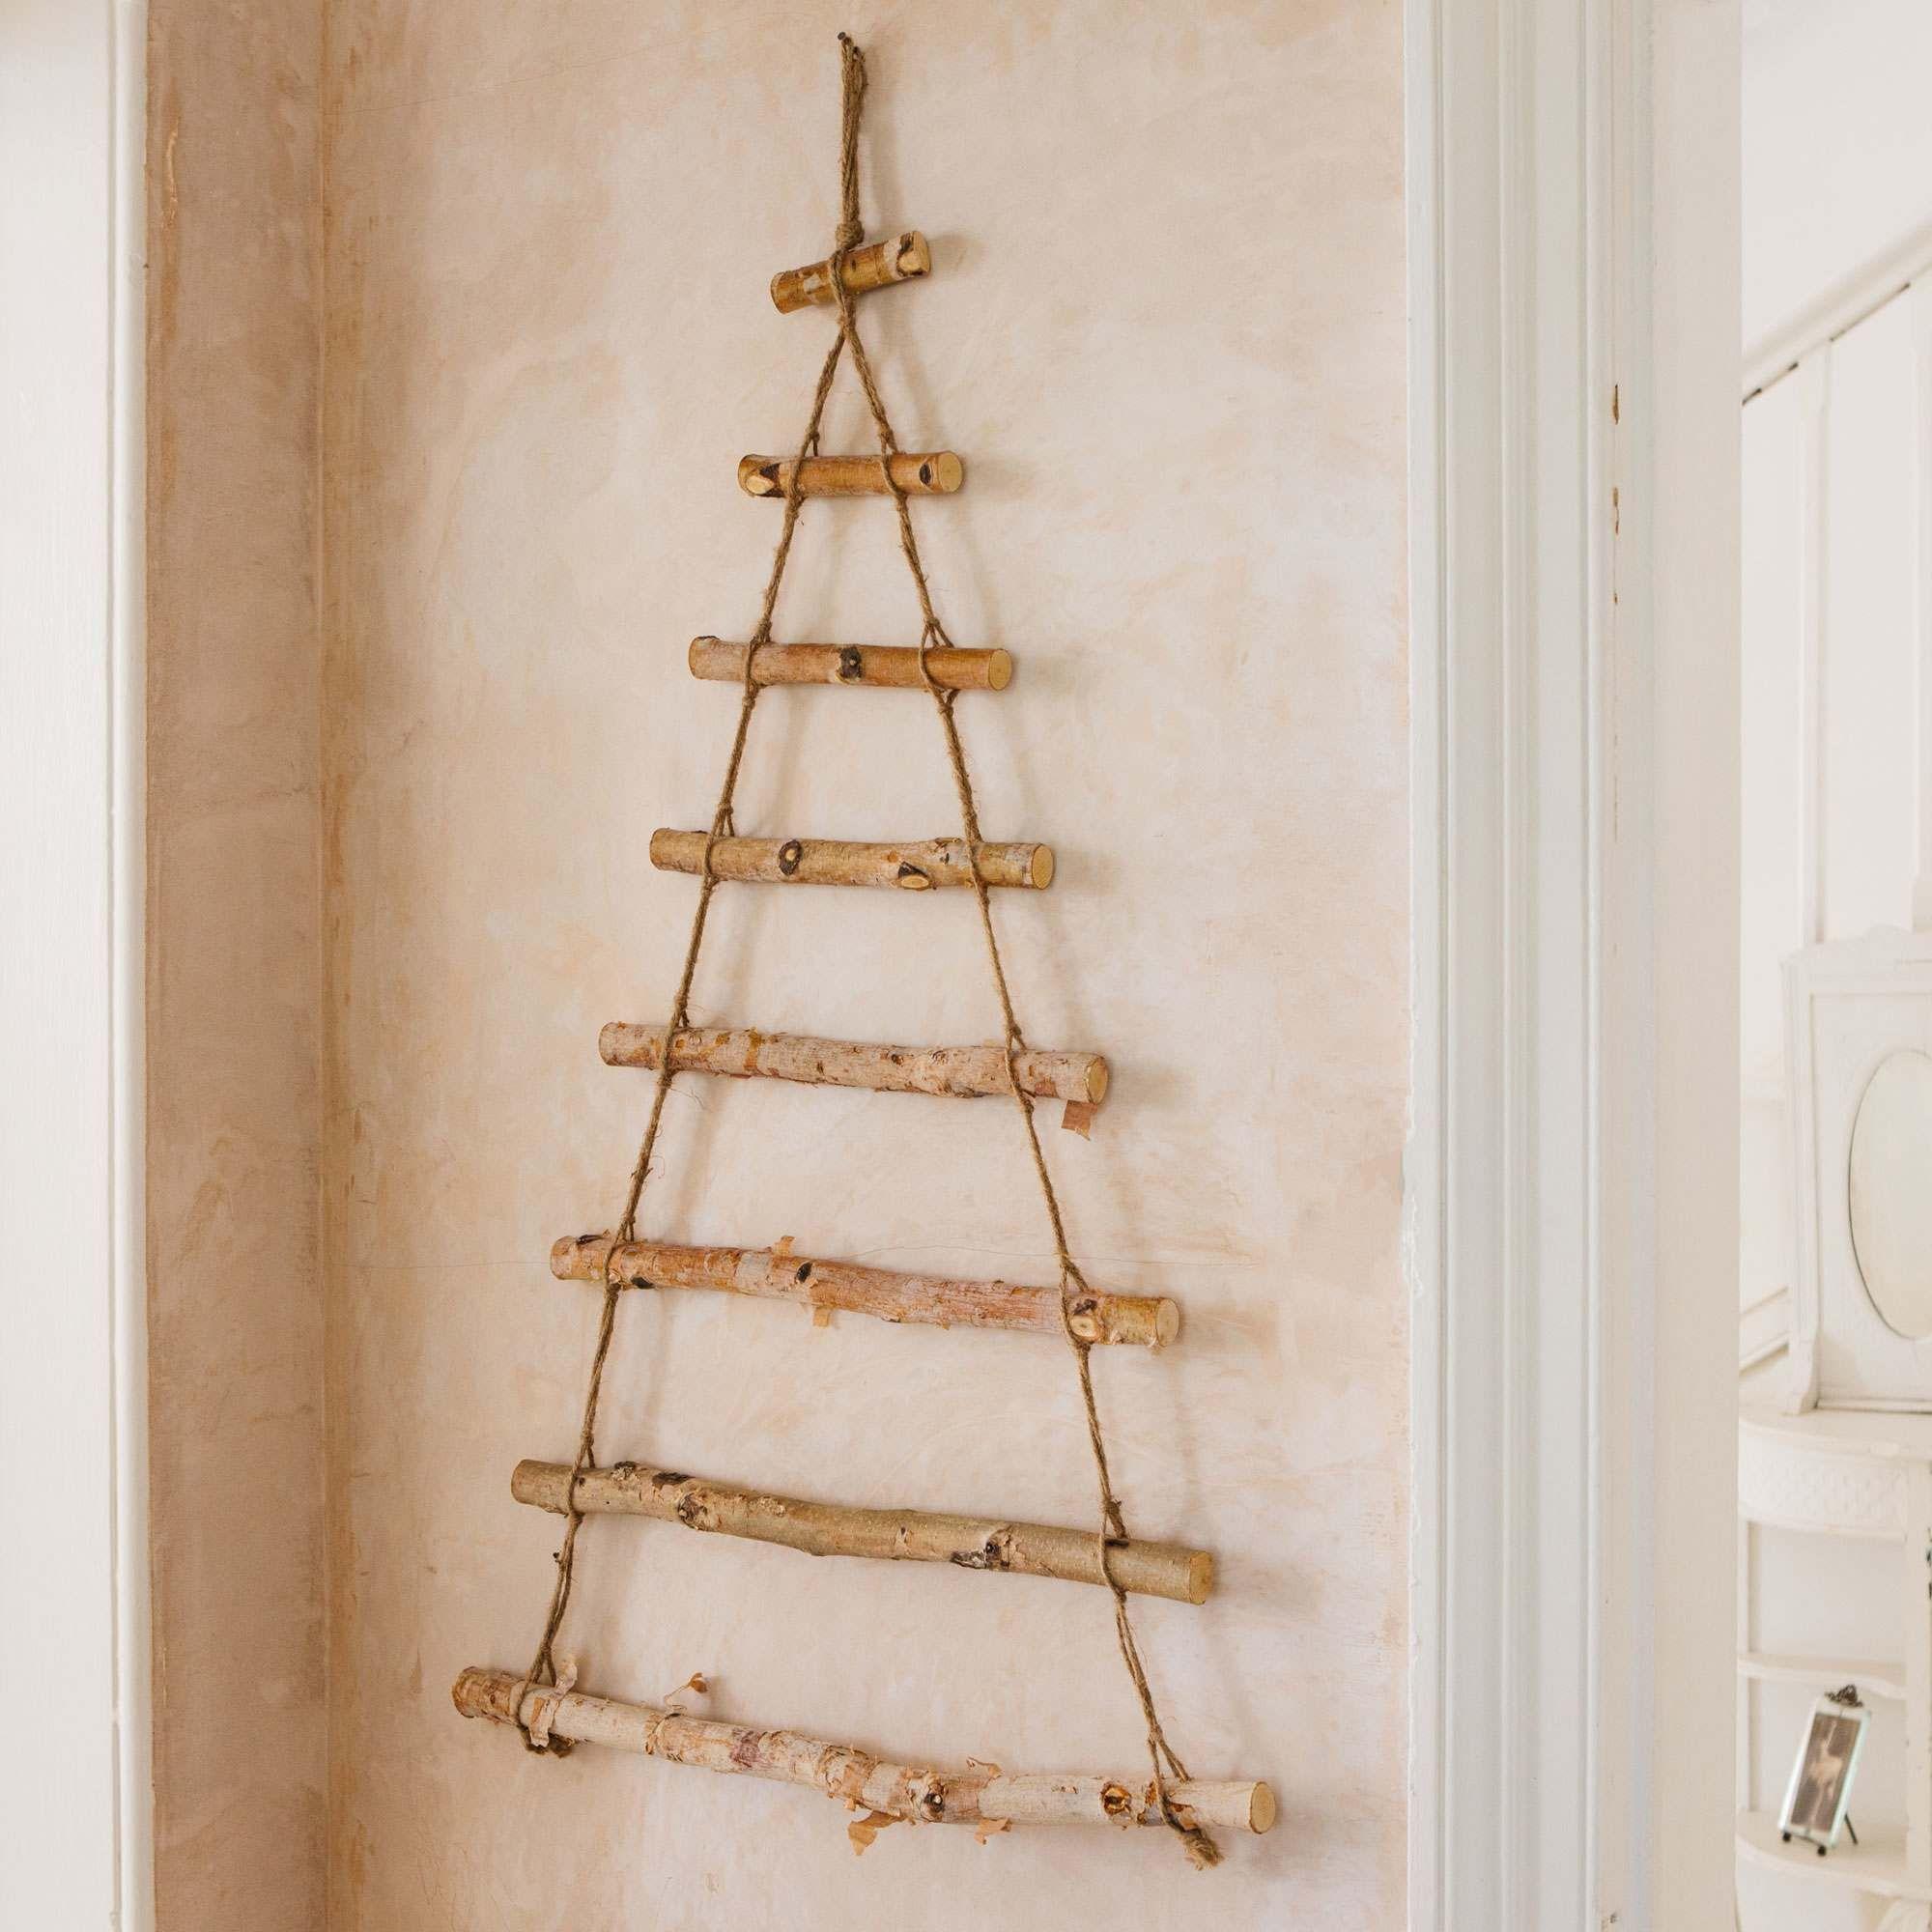 Wooden Ladder Tree Wooden Ladder Christmas Decor Diy Wooden